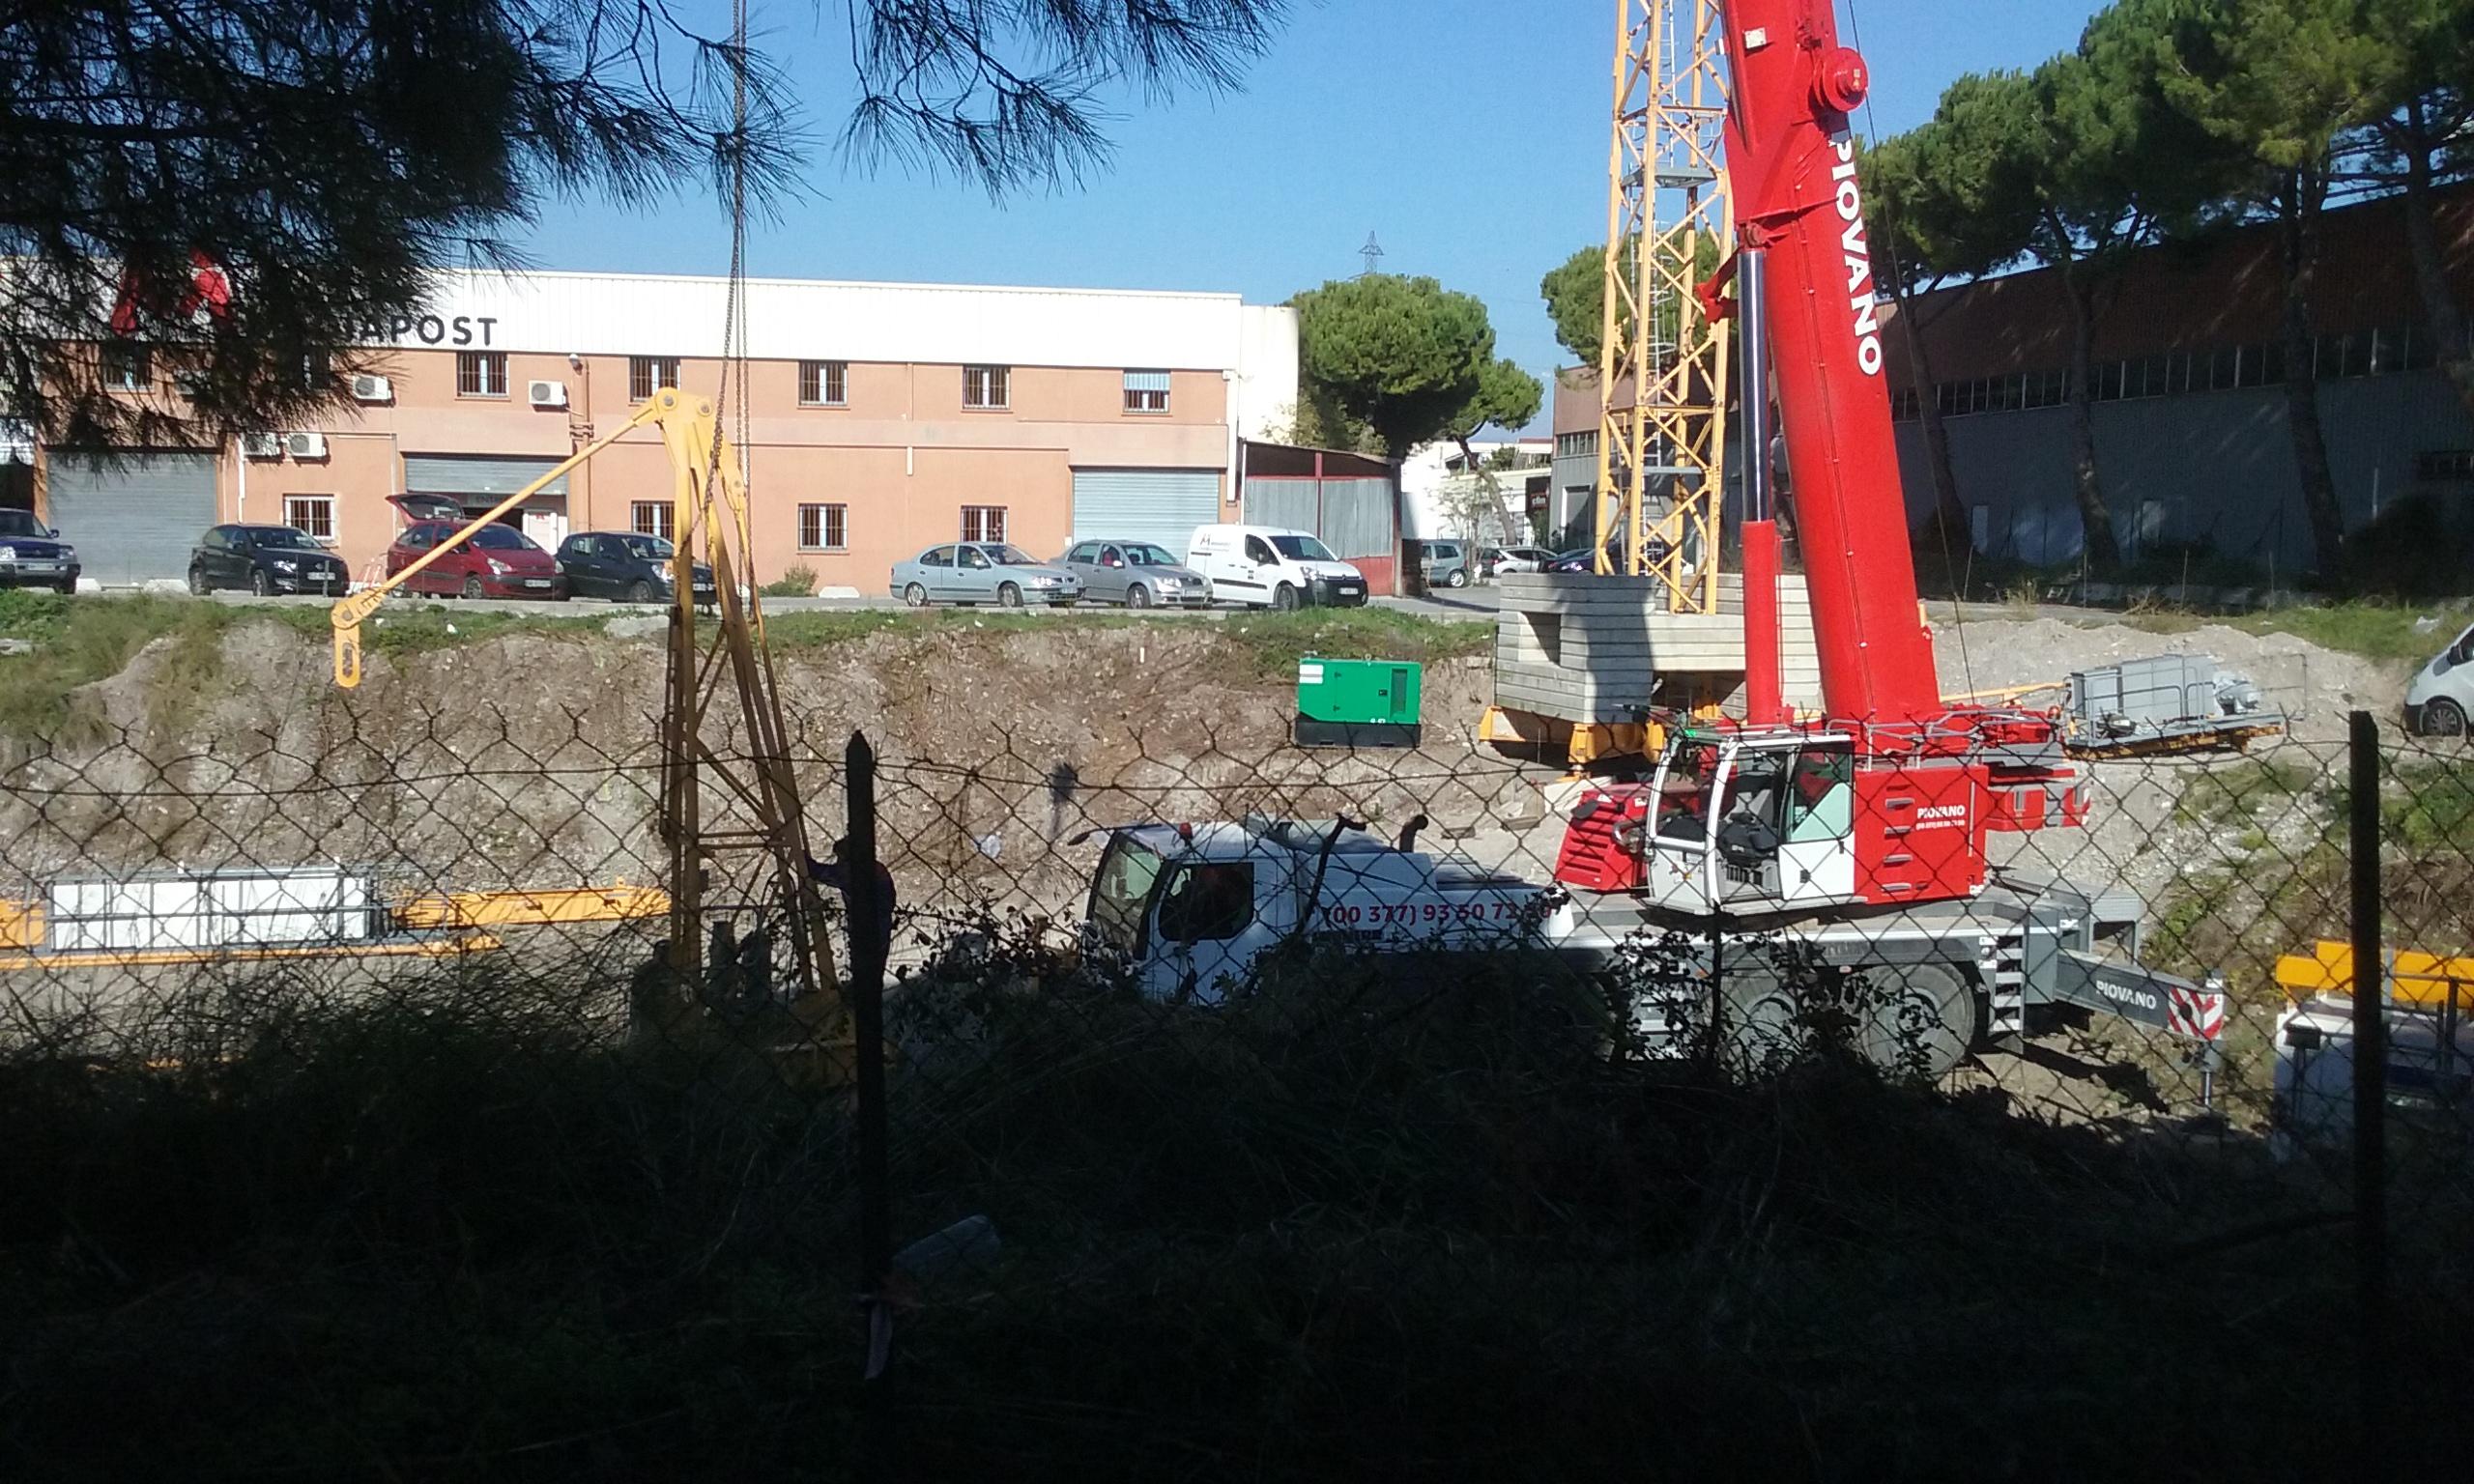 Les Grues de PIOVANO (France & Italie) 48745820151118121133